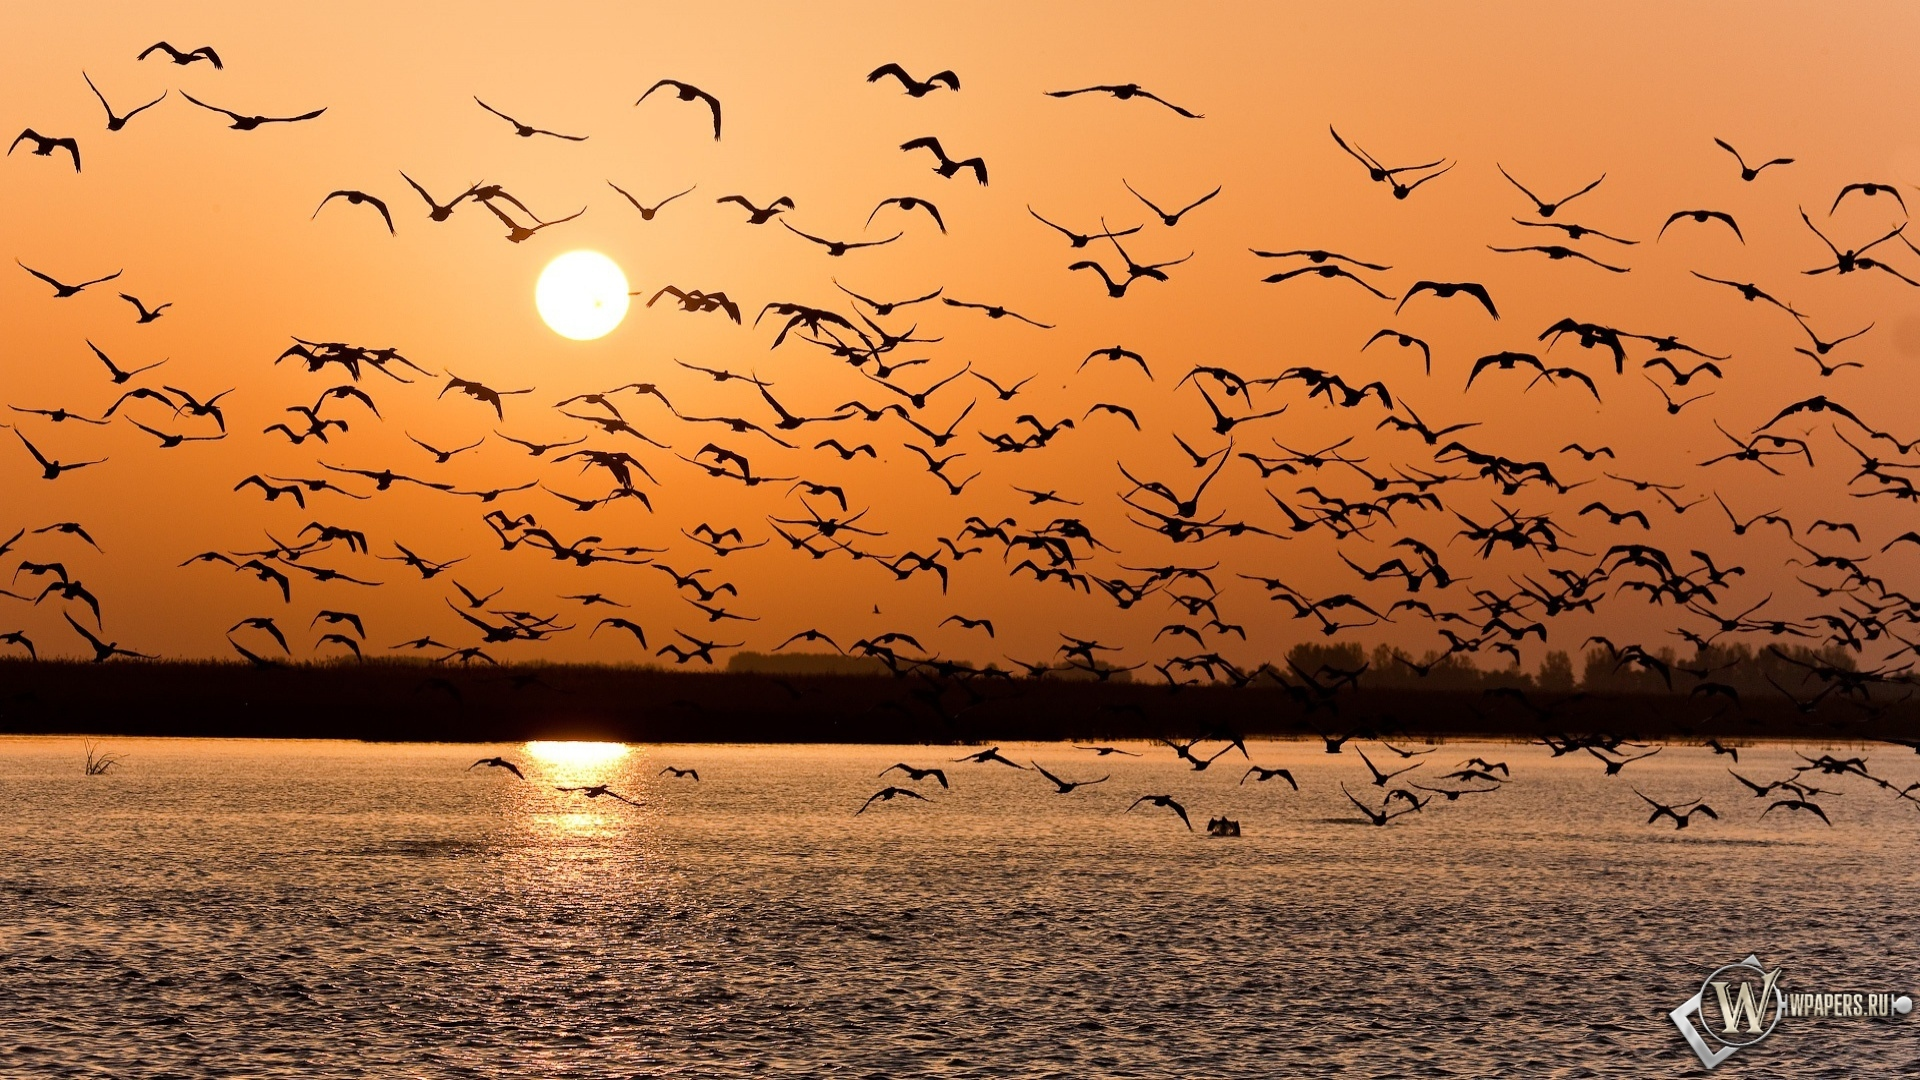 Стая птиц 1920x1080